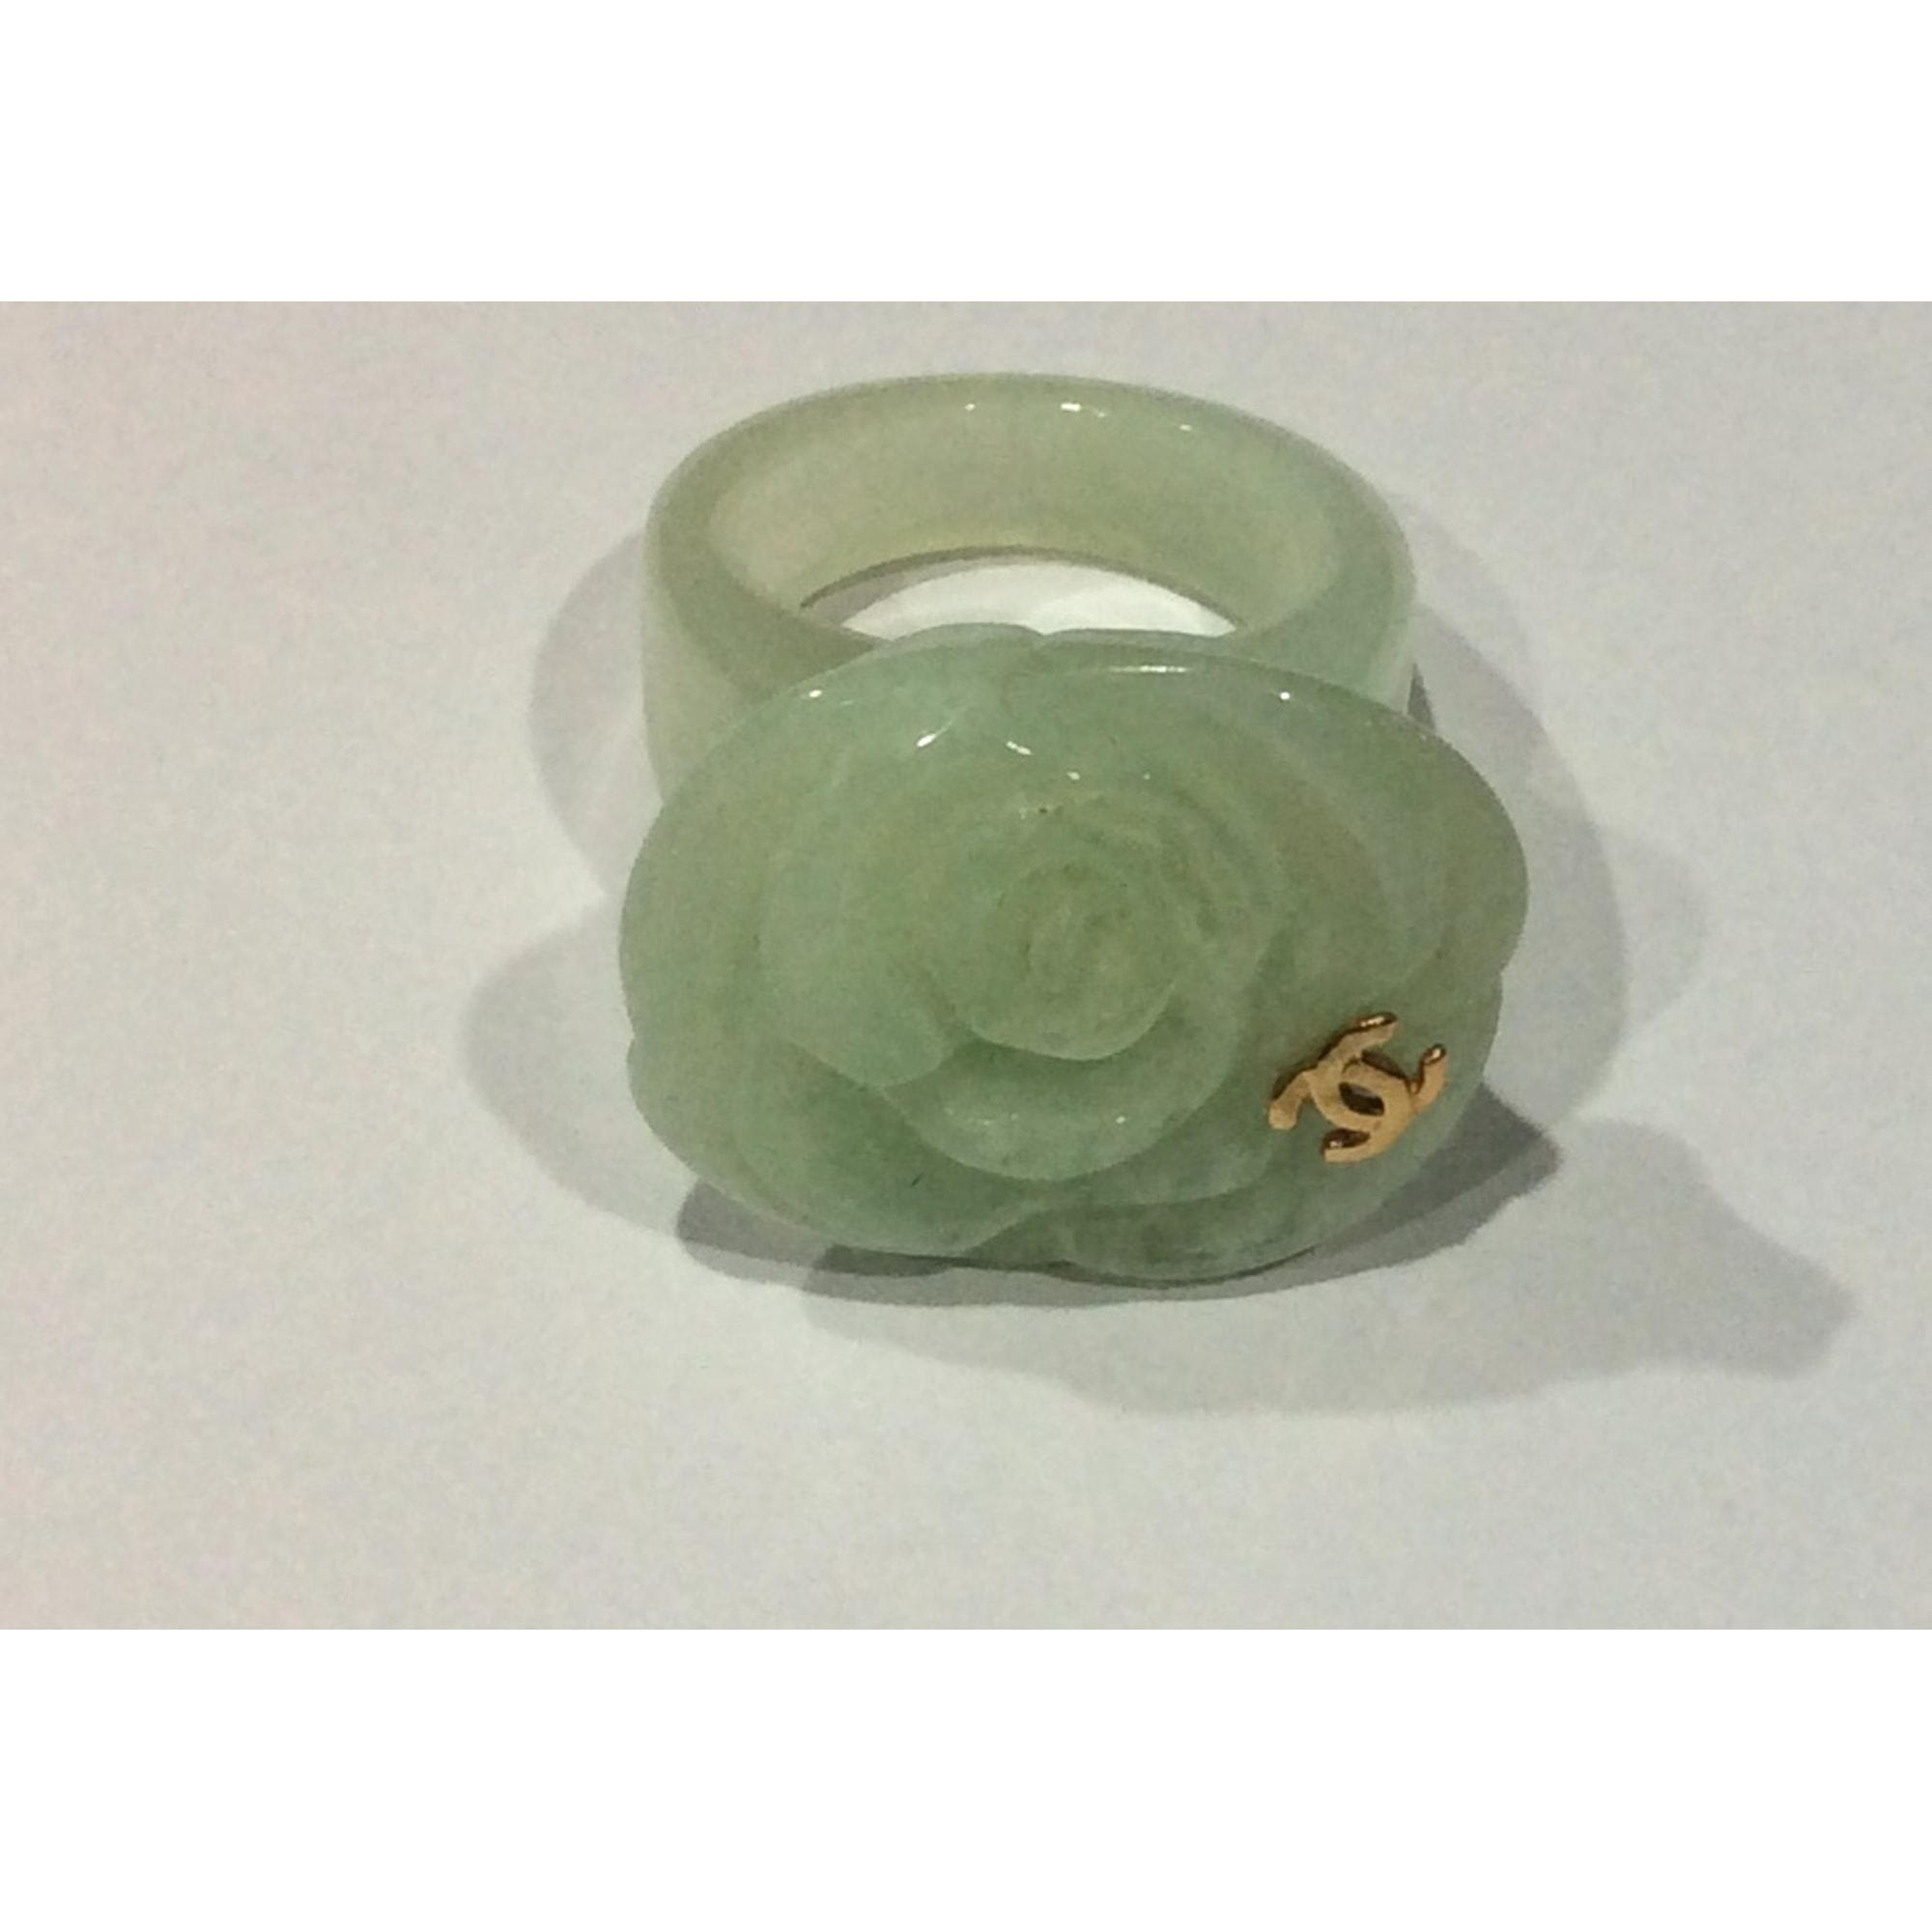 Bague CHANEL plastique Camelia vert 51